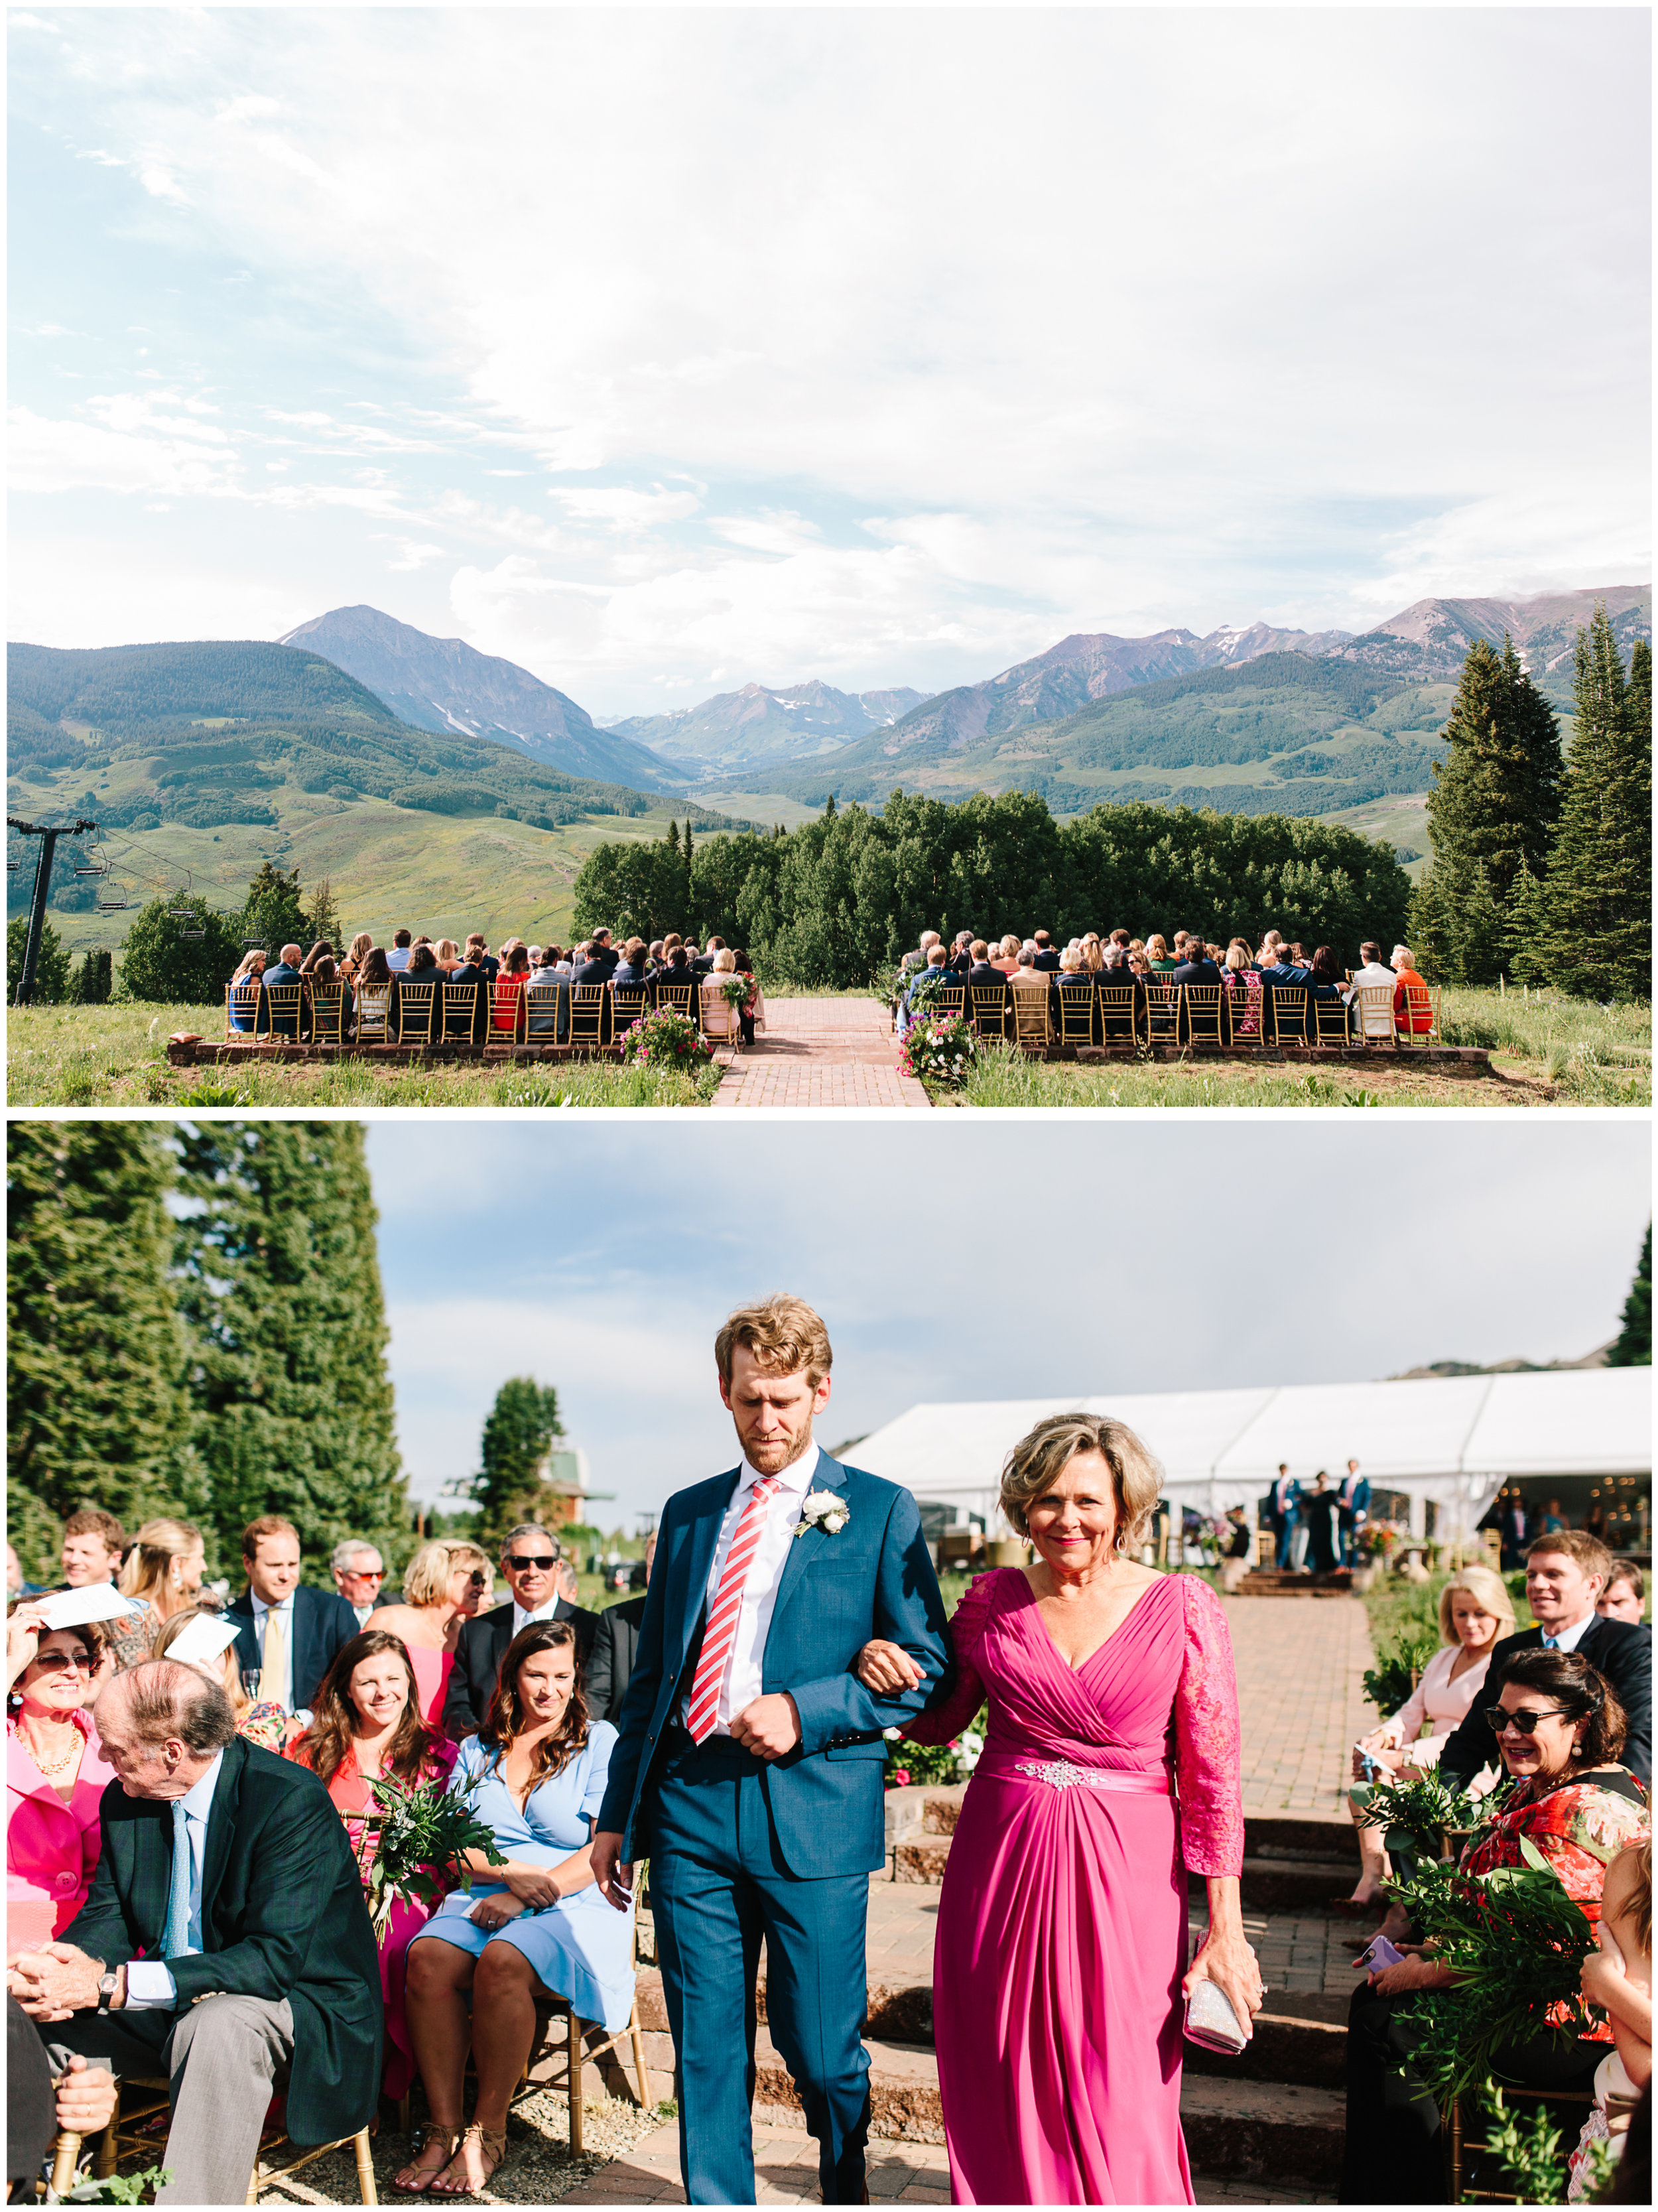 crested_butte_wedding_81.jpg